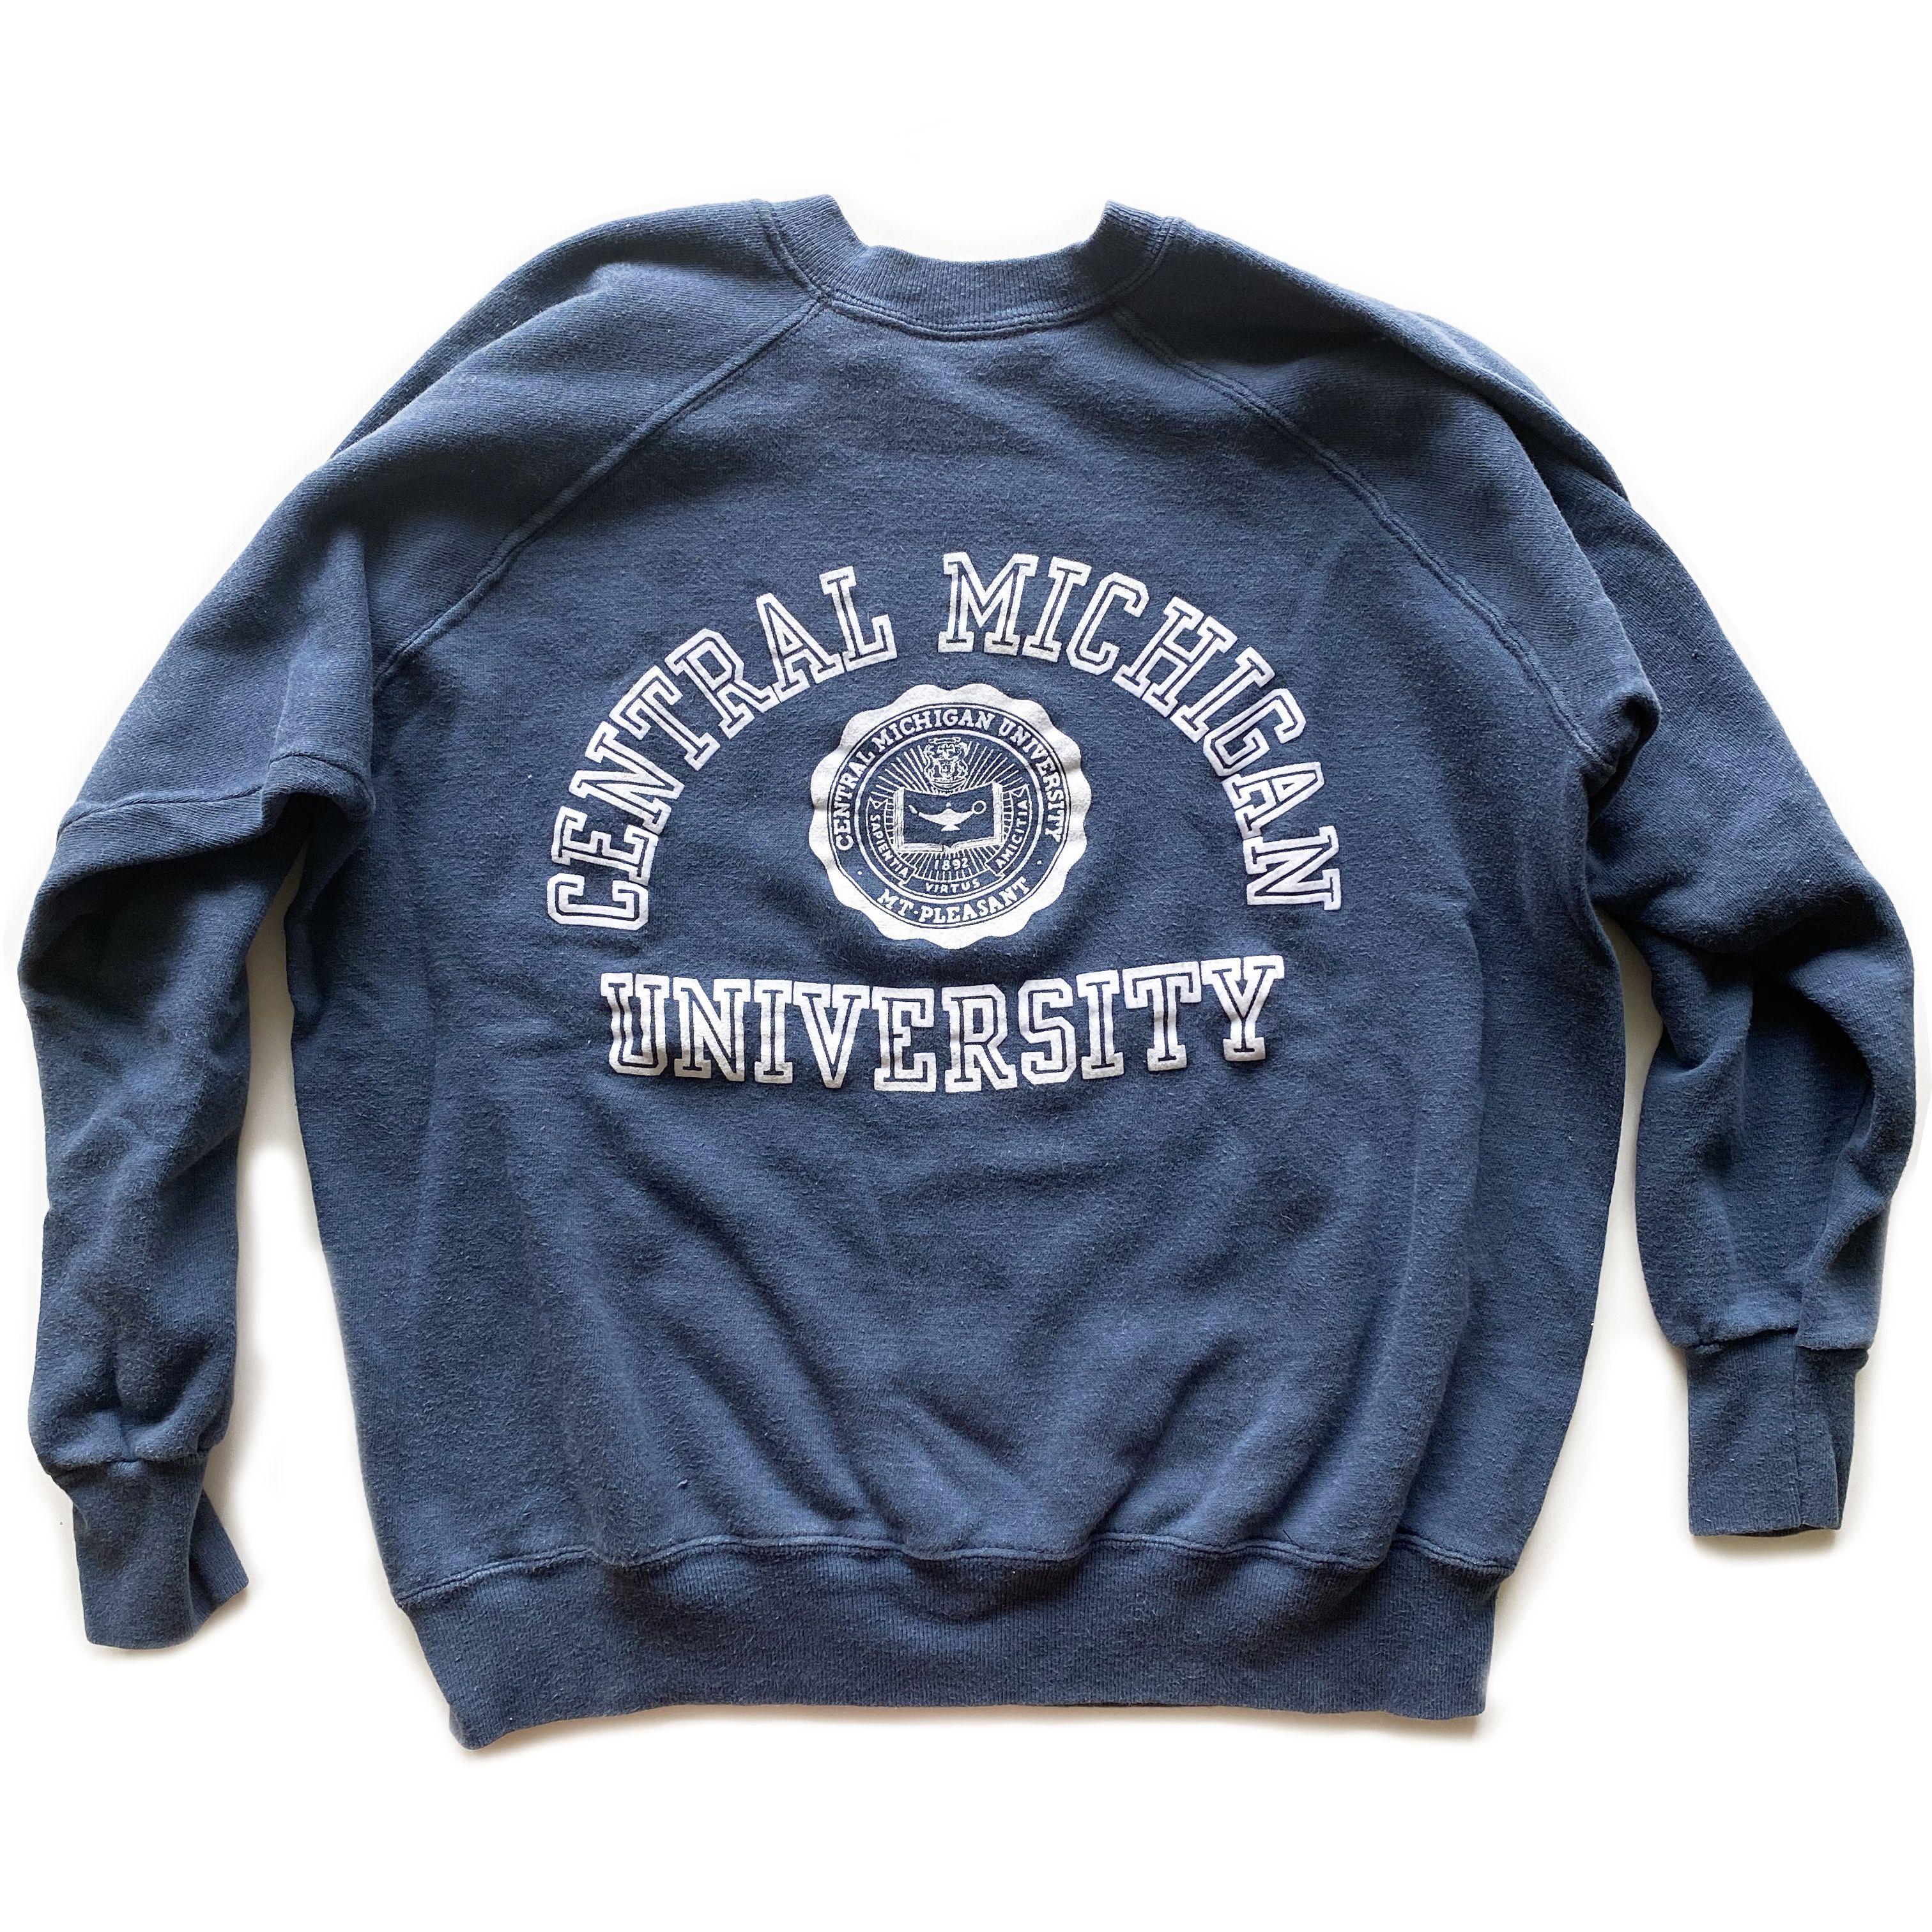 Vintage Central Michigan University Champion Crewneck Sweatshirt Sweatshirts Champion Crewneck Sweatshirt Crew Neck Sweatshirt [ 3024 x 3024 Pixel ]